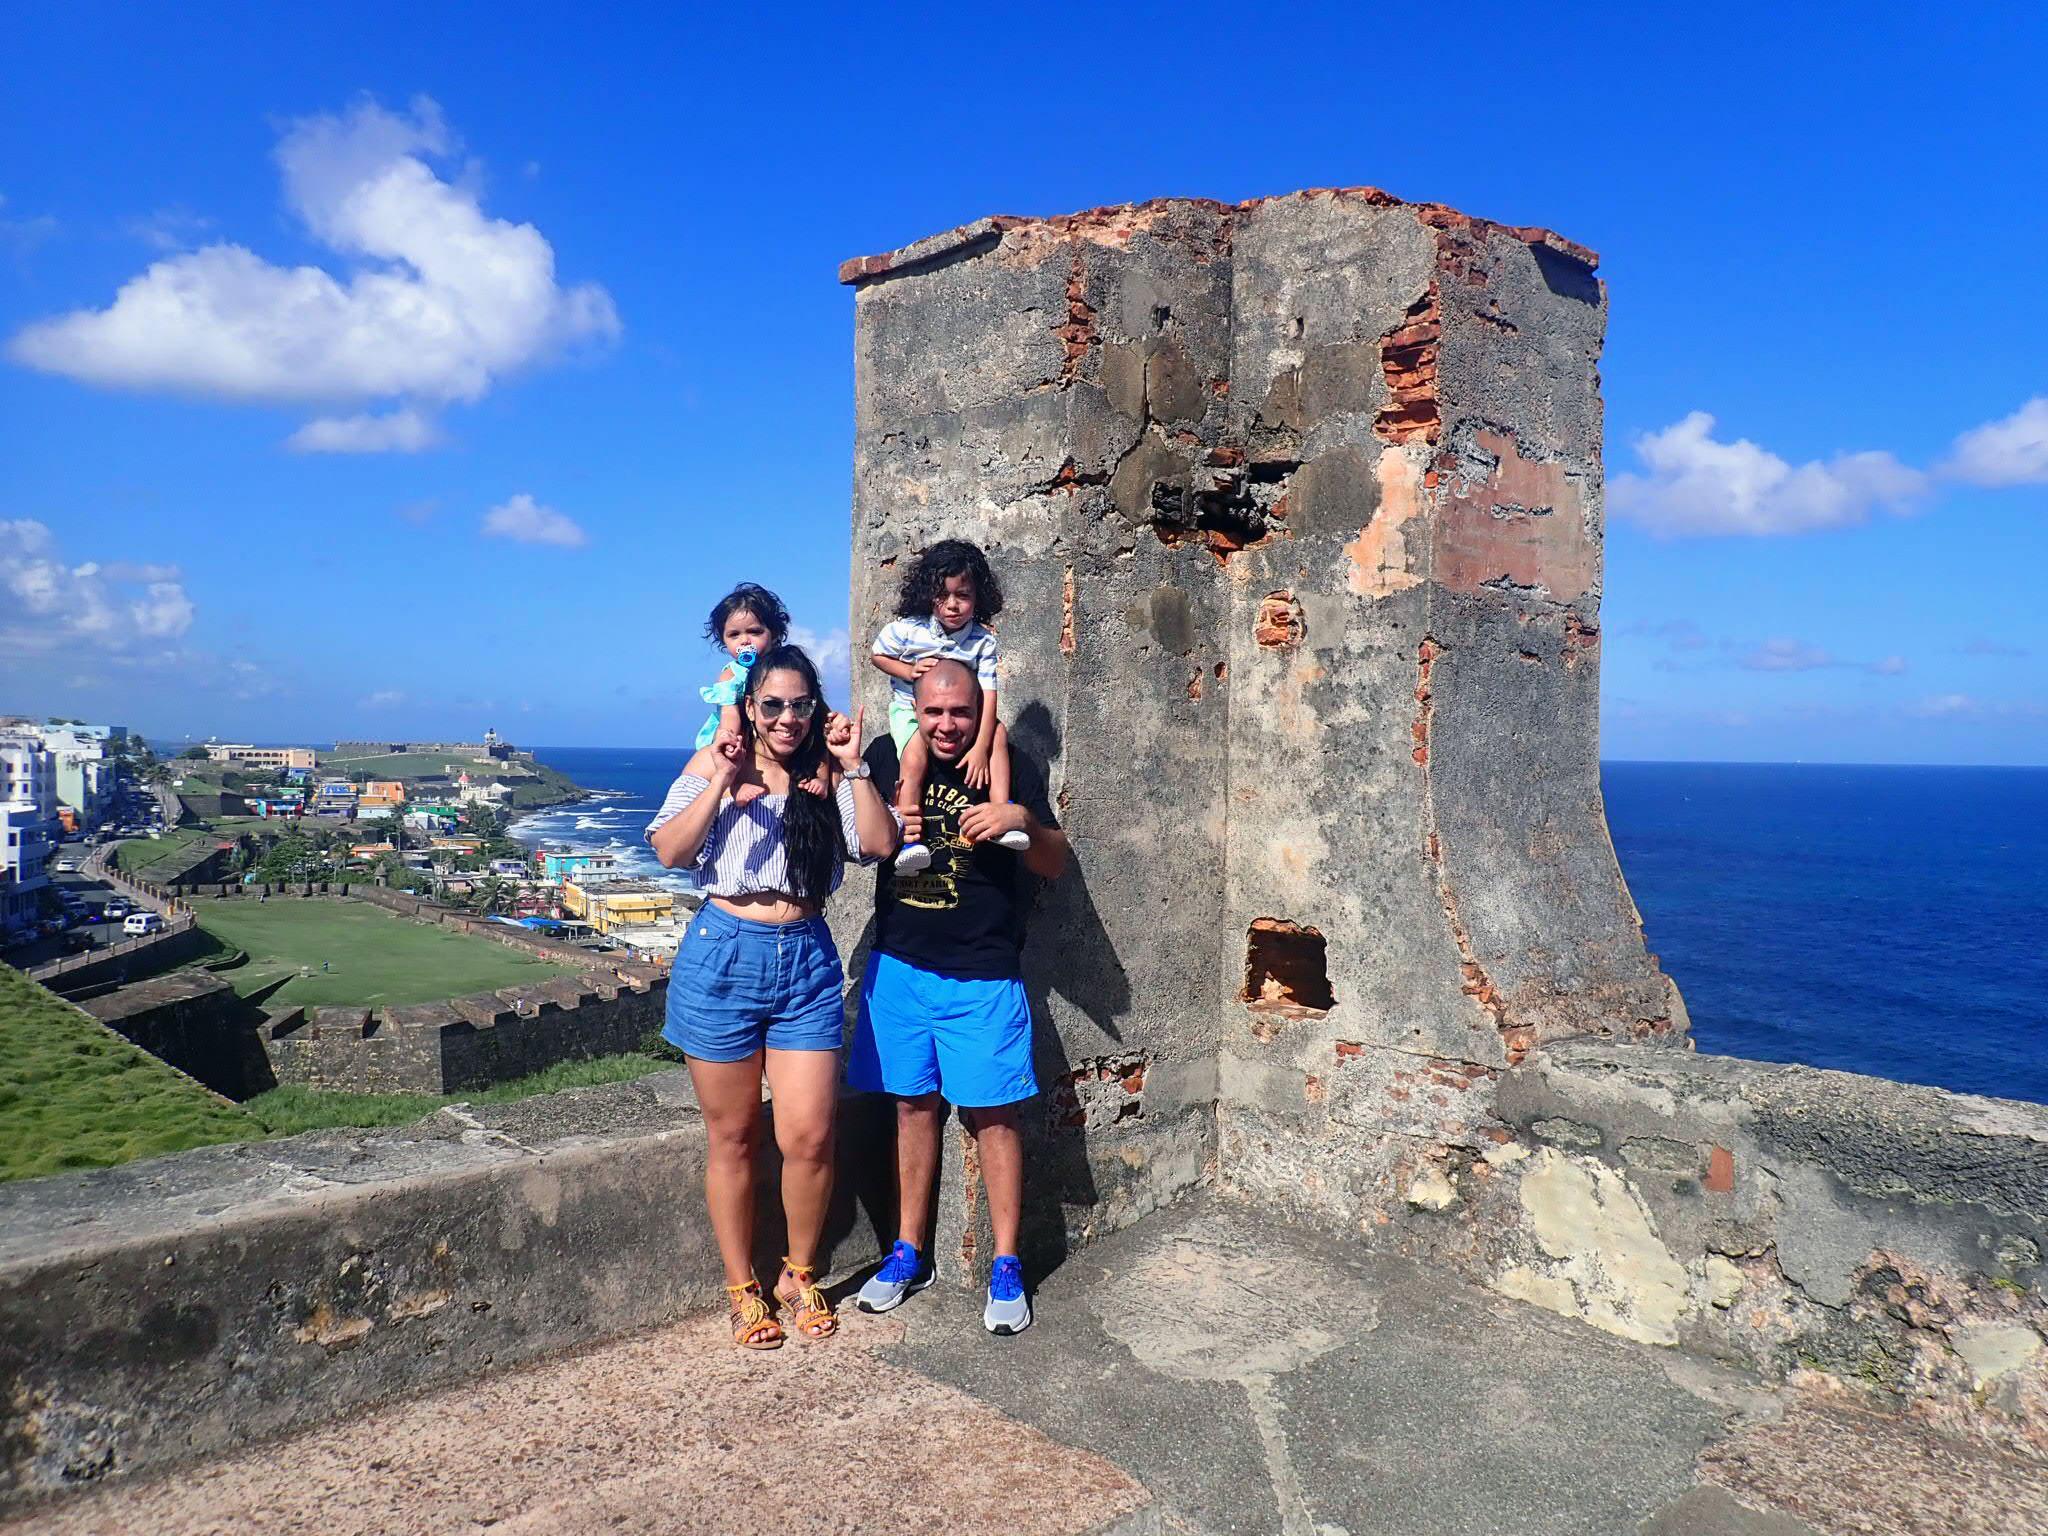 El Morro   El Castillo San Felipe del Morro   El Morro Fort    Old San Juan   Viejo San Juan   Things to do Old San Juan   Things to do Viejo San Juan   Puerto Rico Things To Do   www.anajacqueline.com